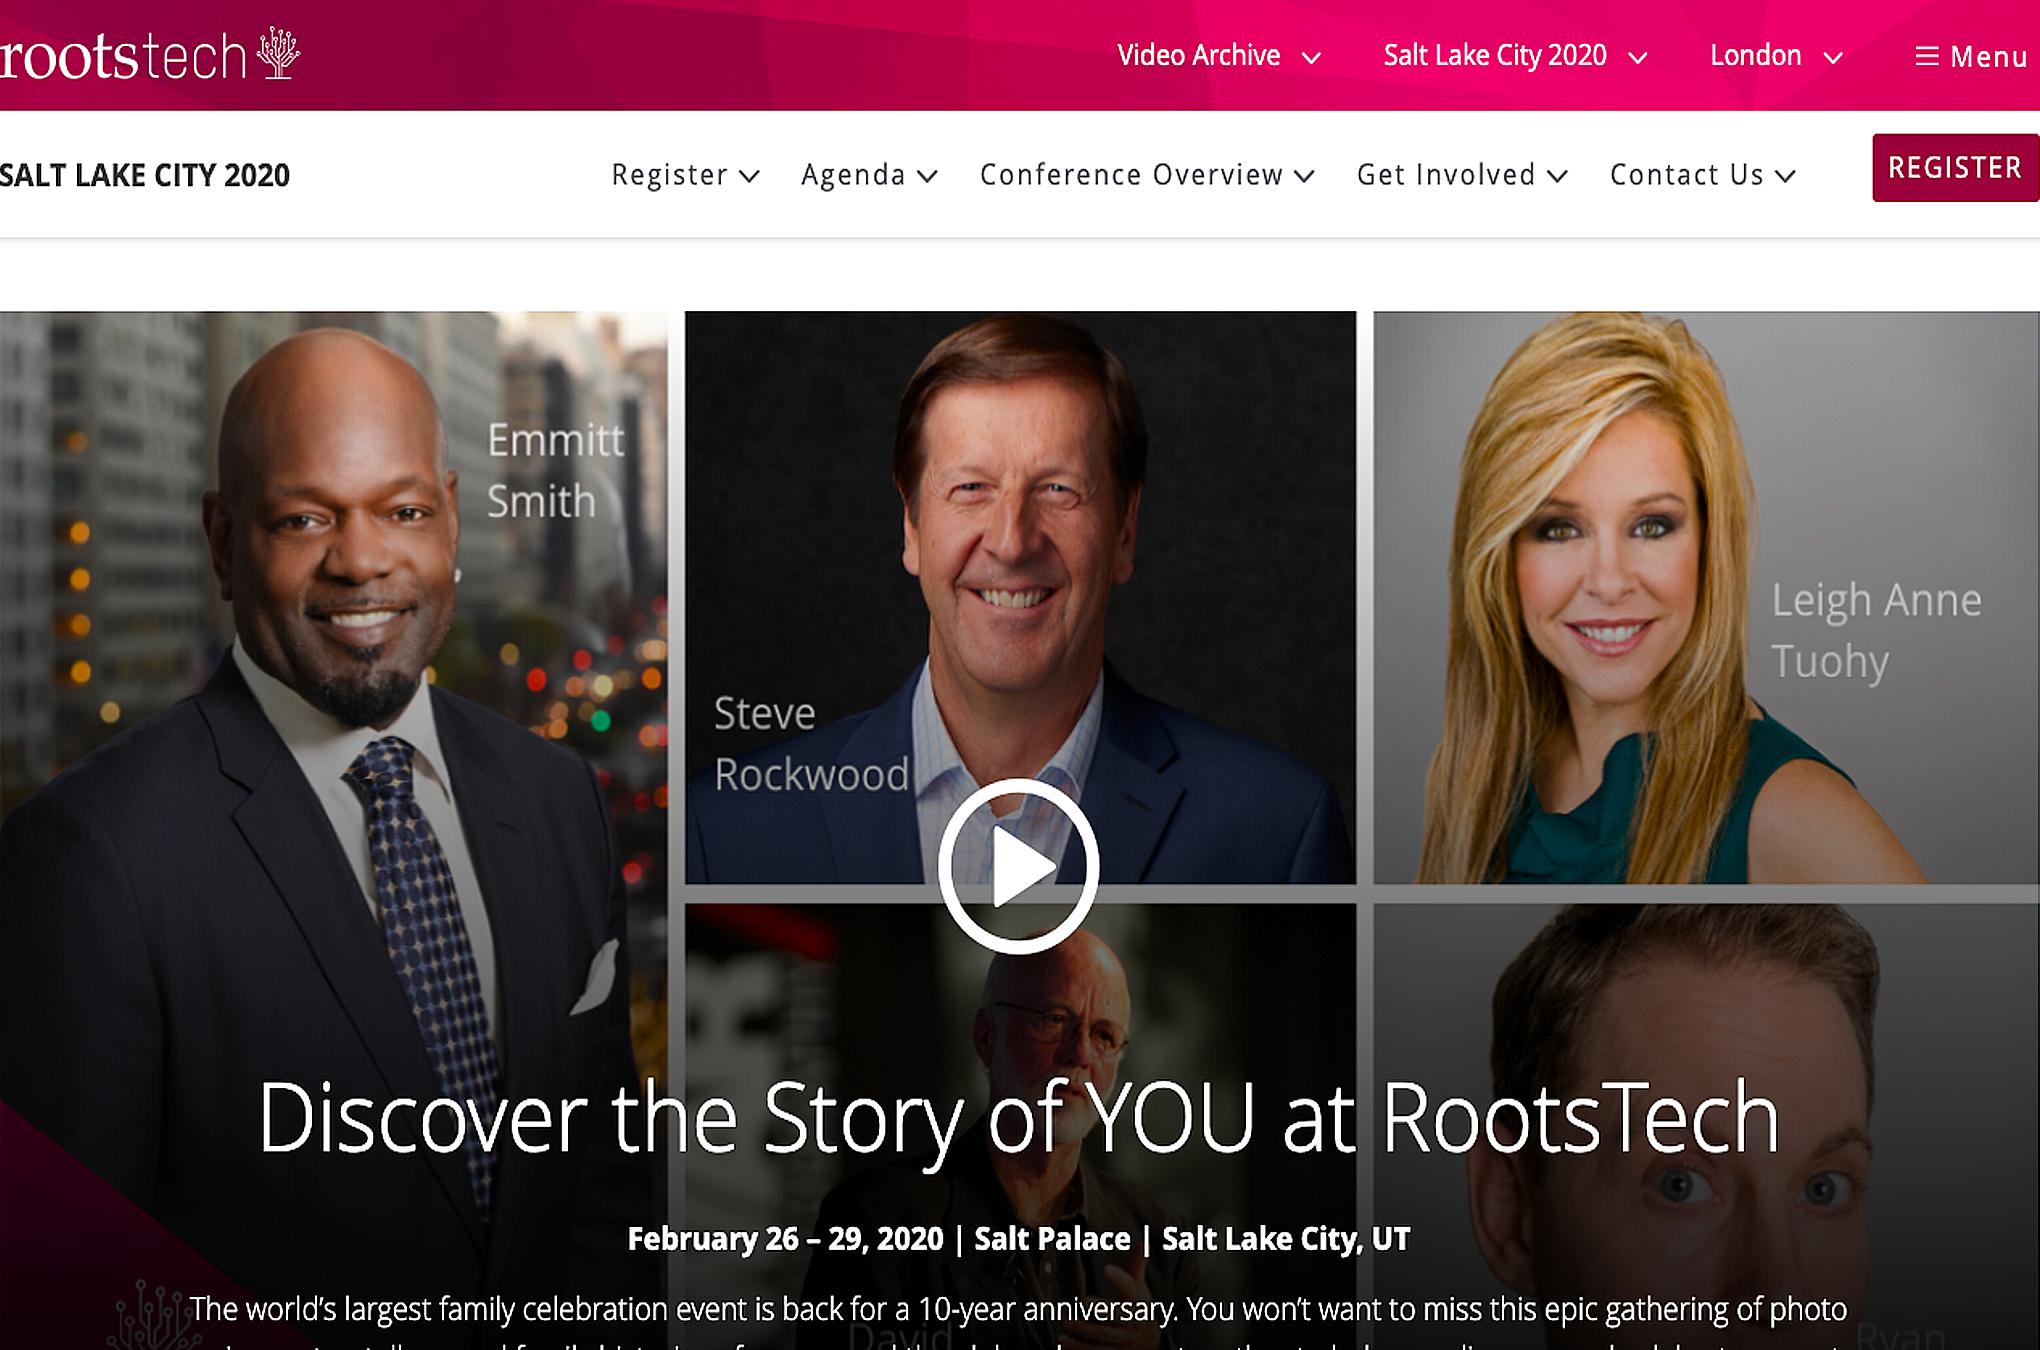 USA : Rootstech 2020 ouvre ses portes pour 4 jours intenses